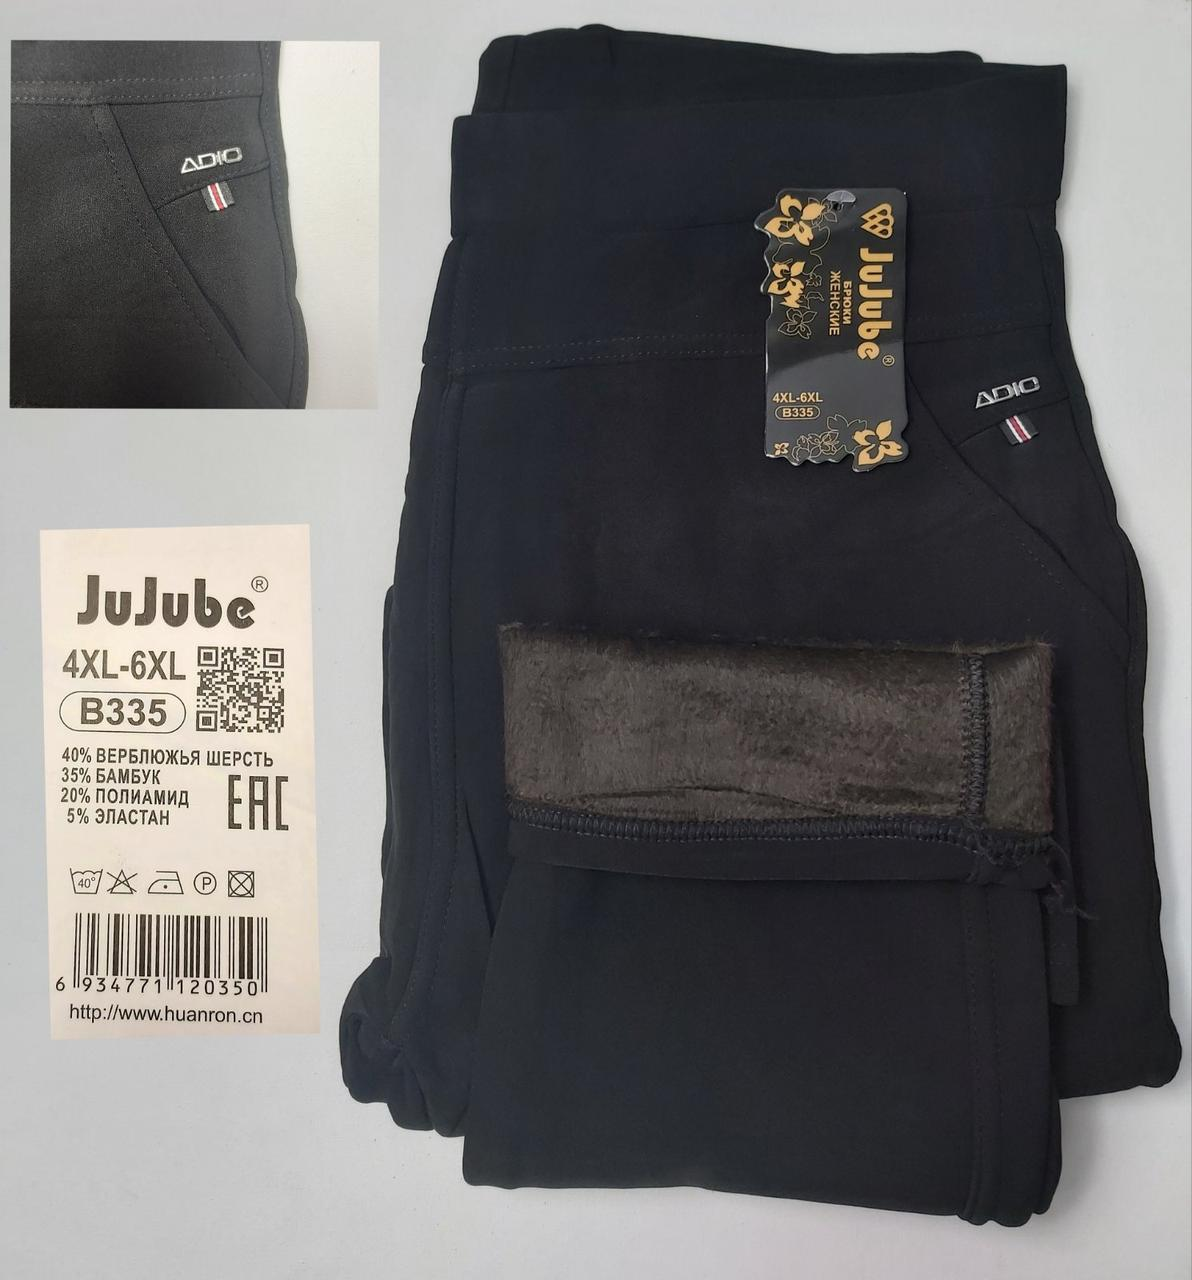 Брюки женские на меху JuJuBe L-8XL (6 шт)